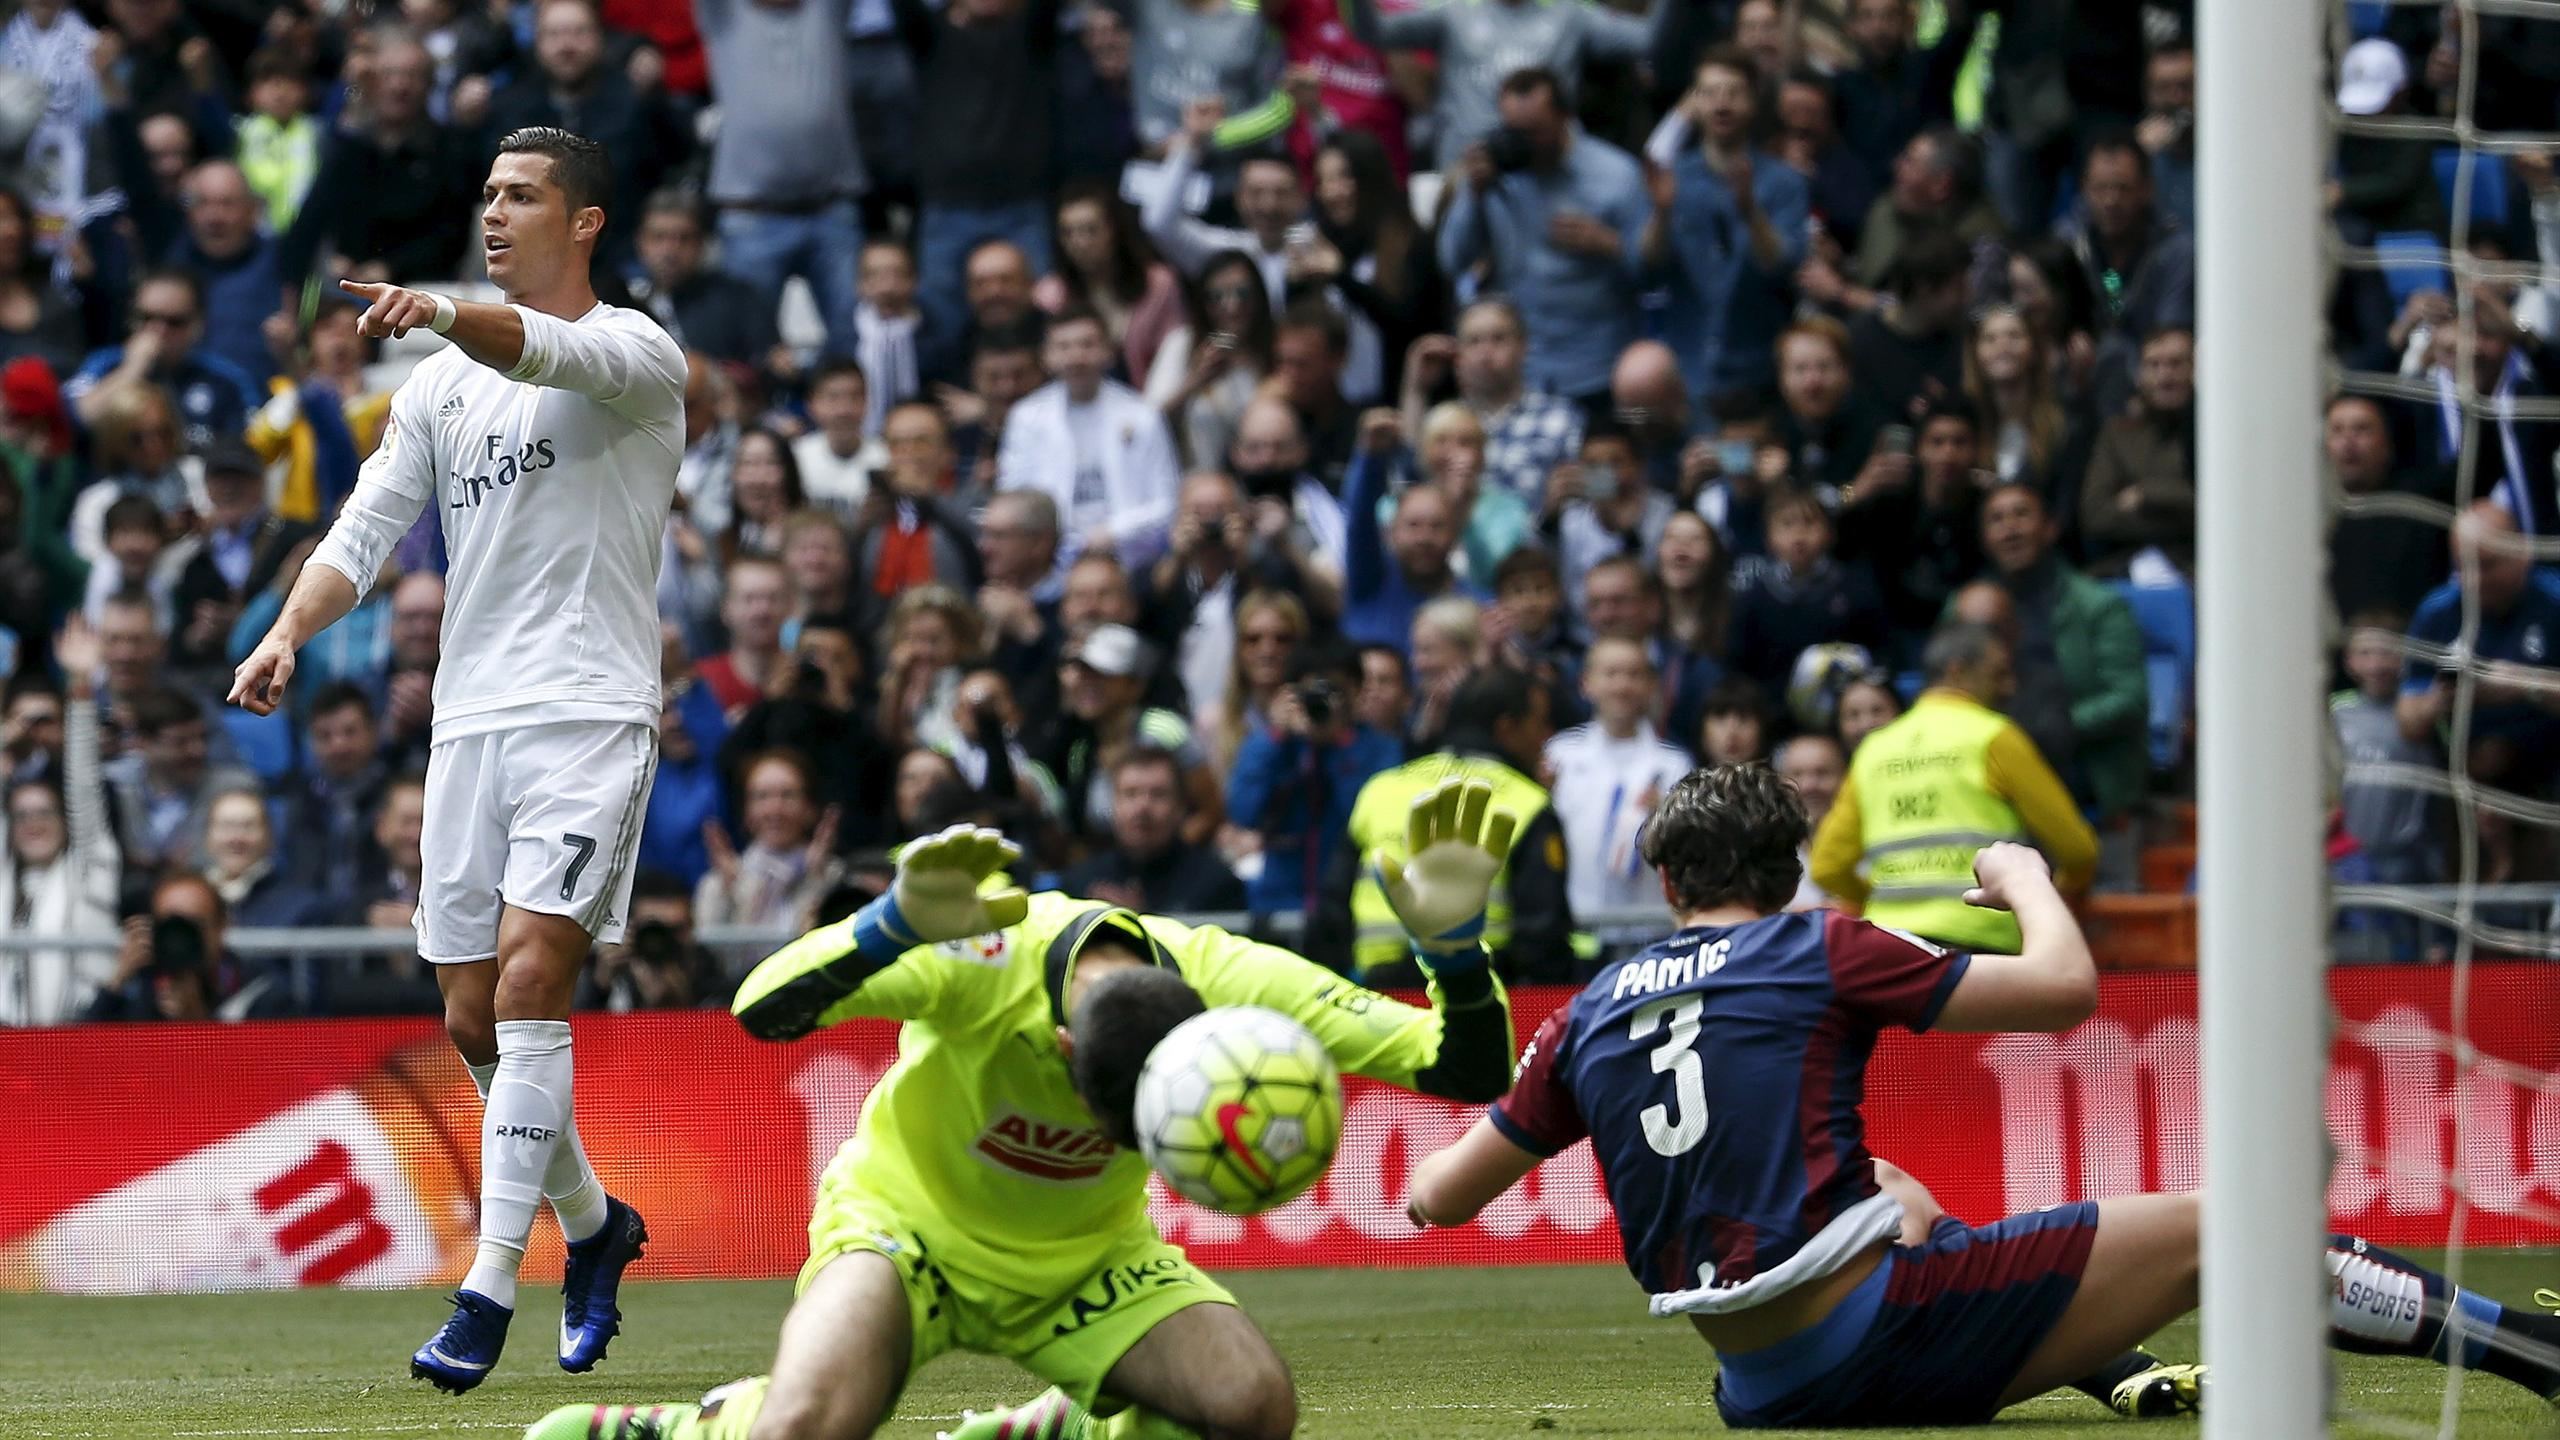 Cristiano Ronaldo (L) celebrates scoring a goal against Eibar